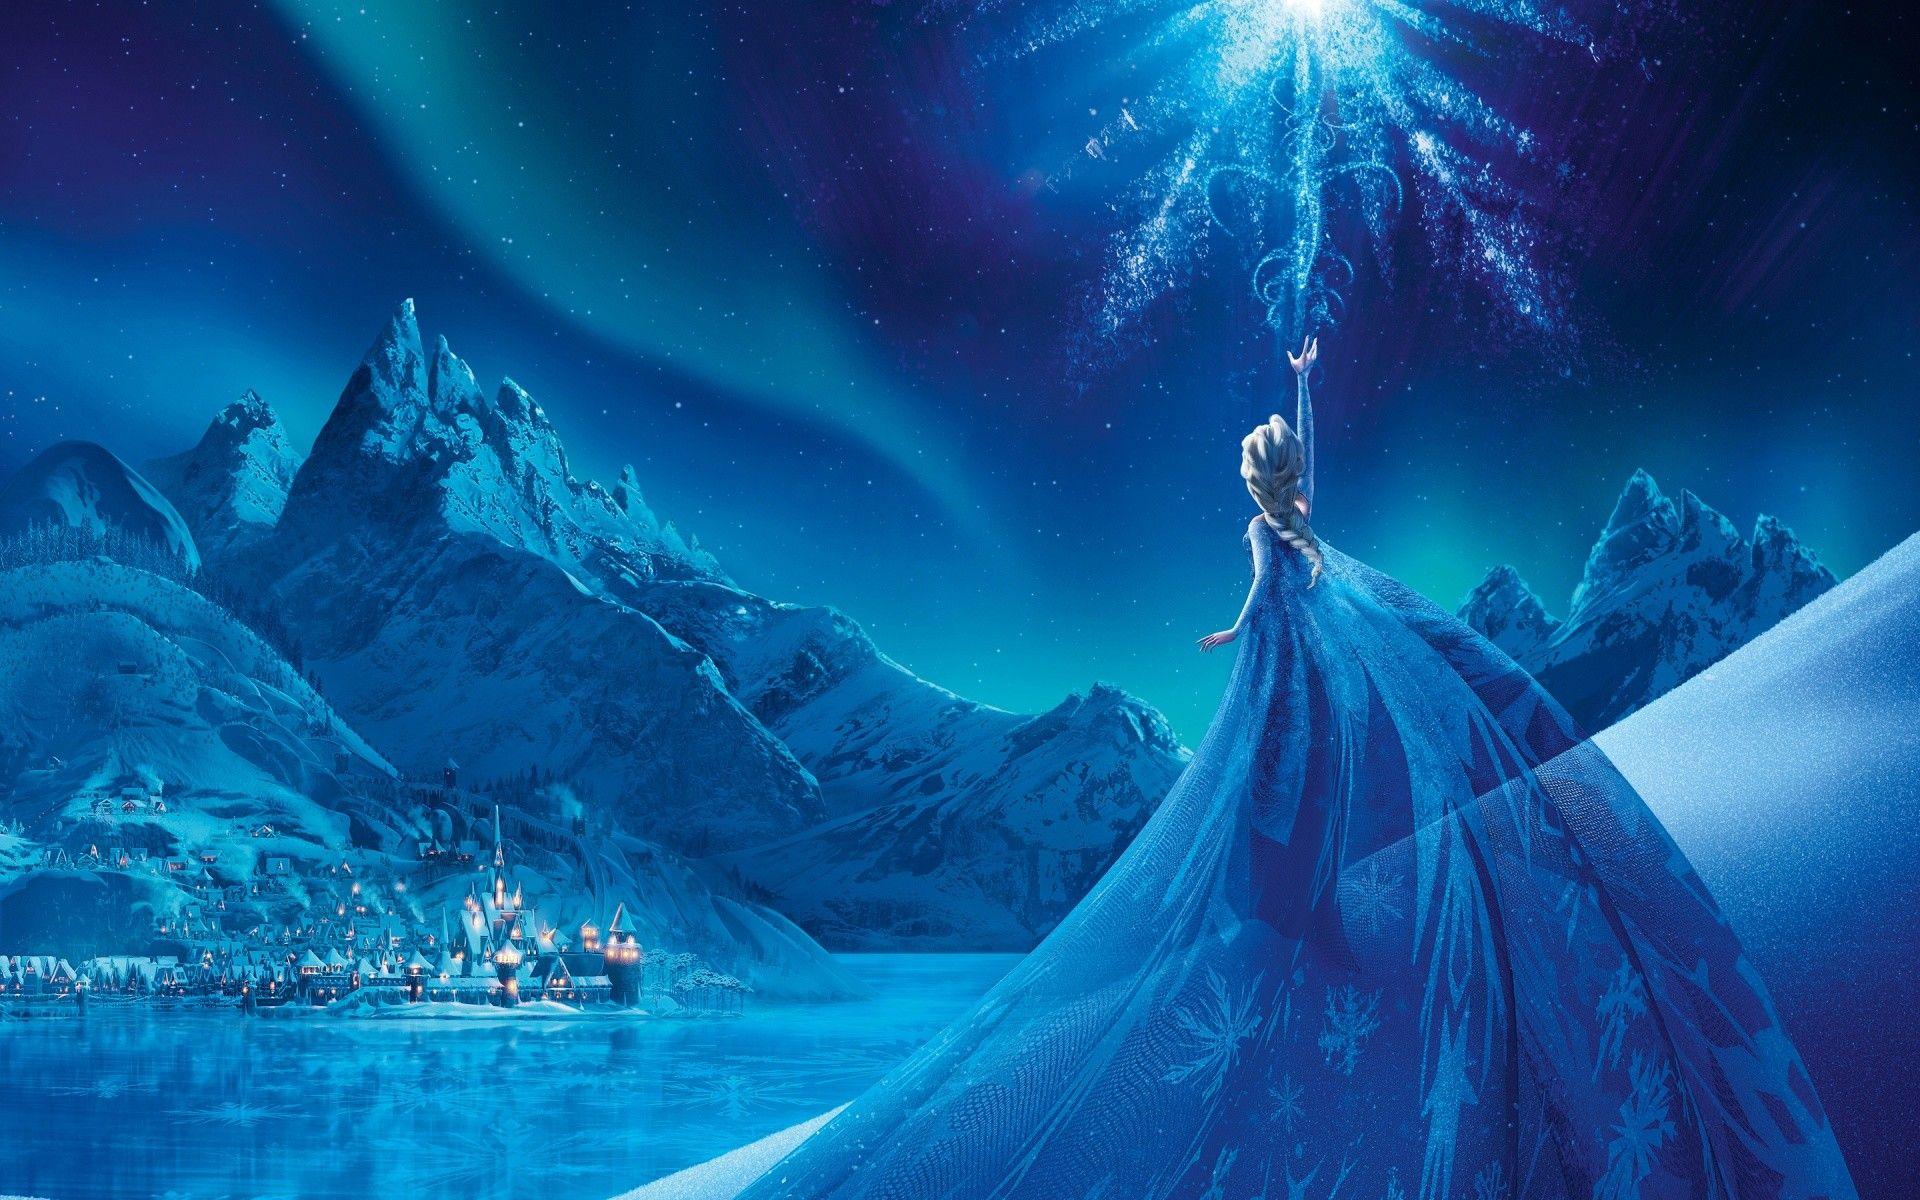 Disney Elsa Flees to the Mountains Wallpaper Mural